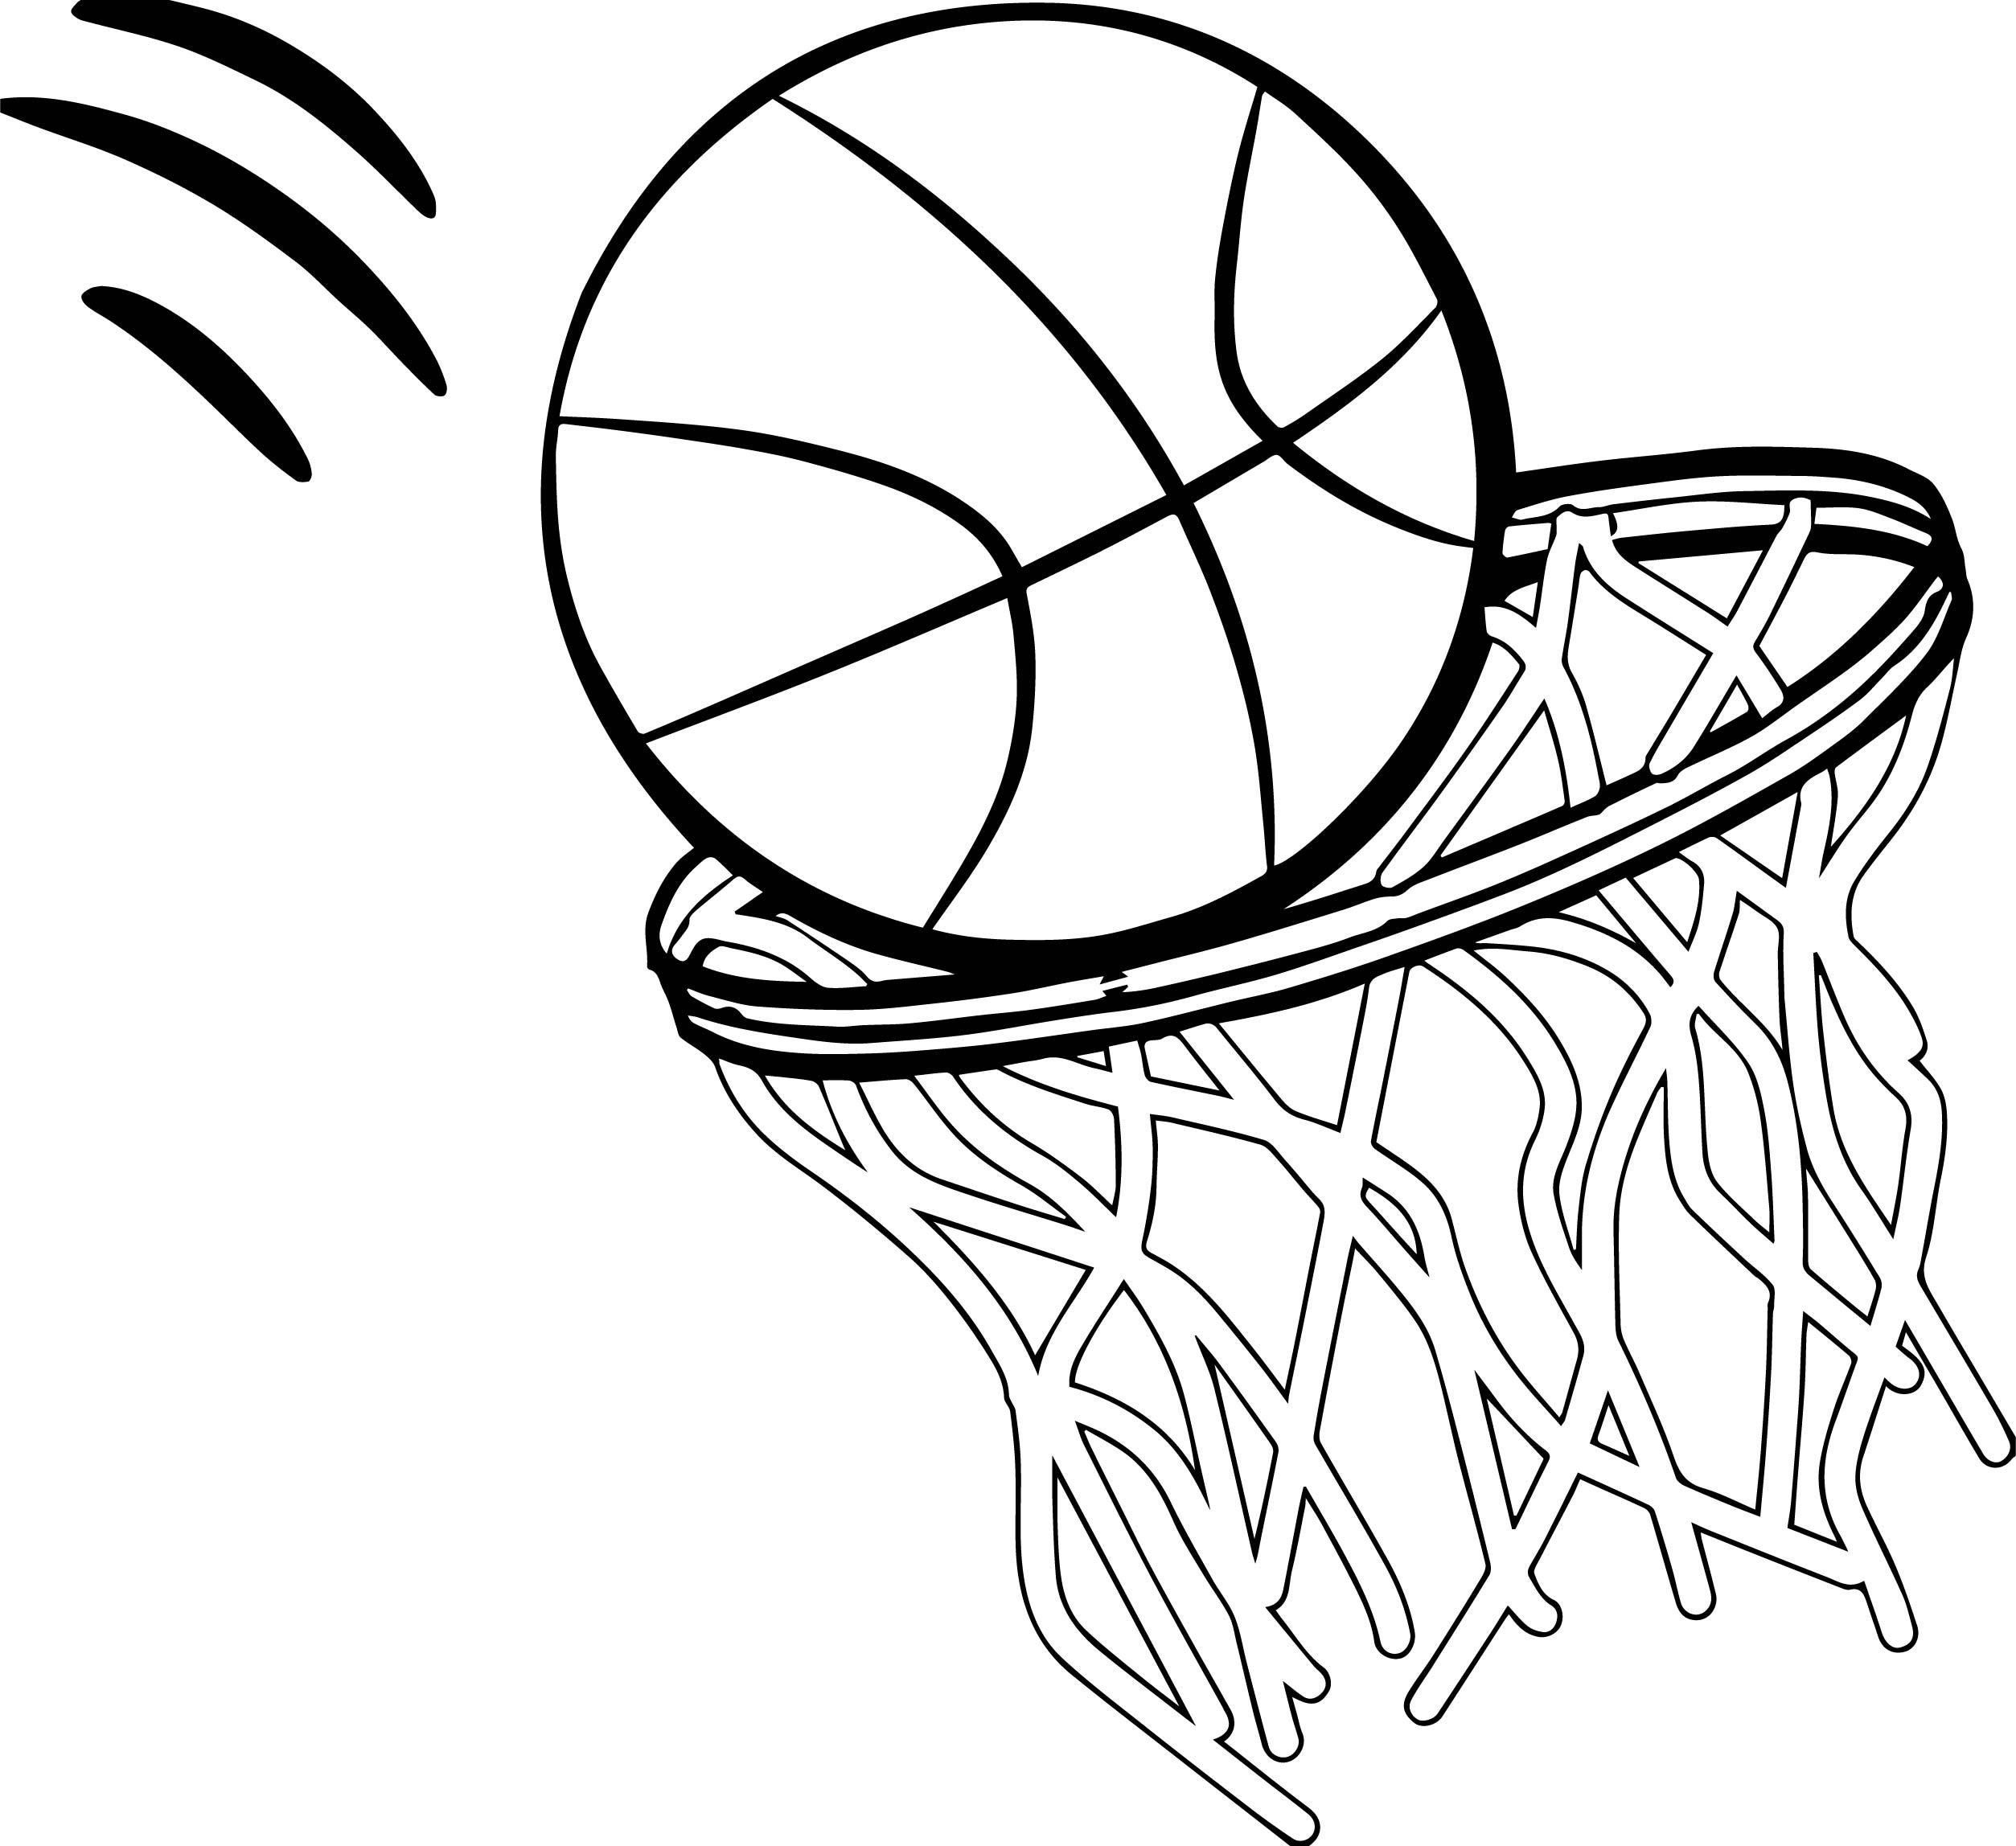 Basketball Rim Drawing At Getdrawings